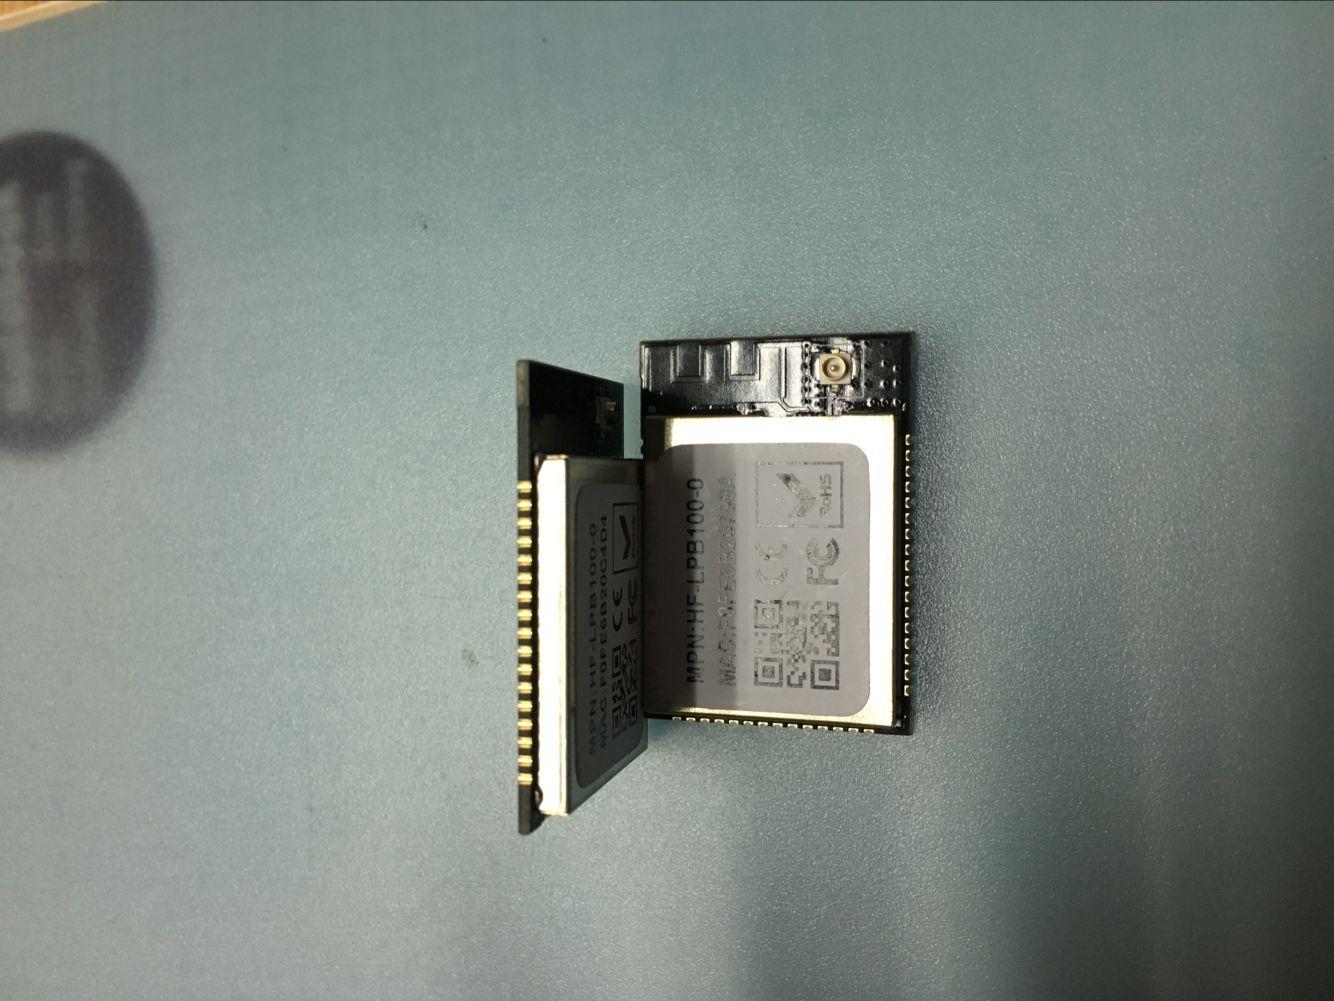 Low power, audio frequency configuration, UART serial port, WiFi wireless module, HF-LPB100U-0